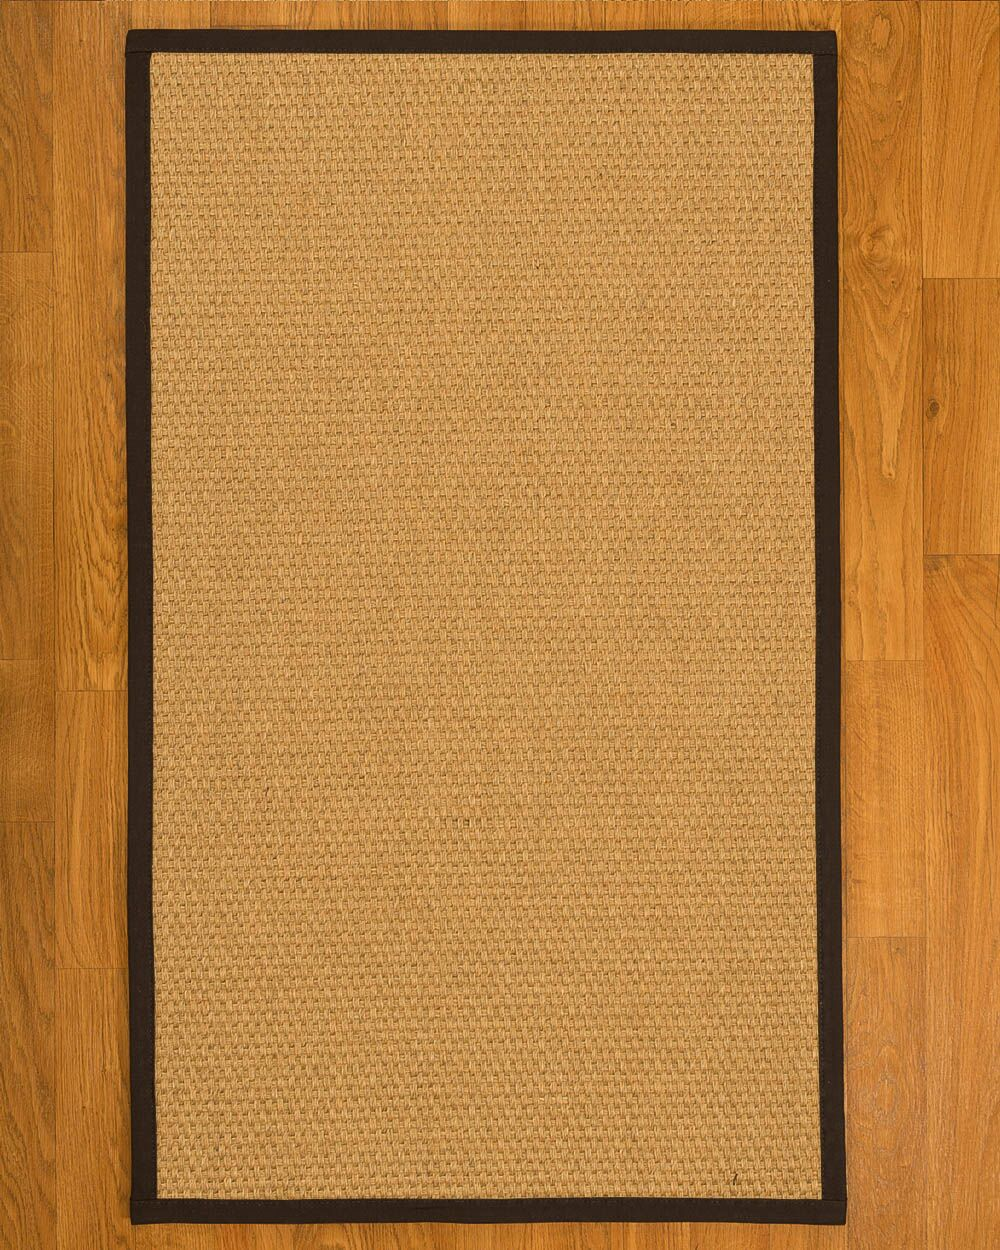 Aureliana Hand Woven Fiber Sisal Brown/Fudge Area Rug Rug Size: Rectangle 3' x 5'